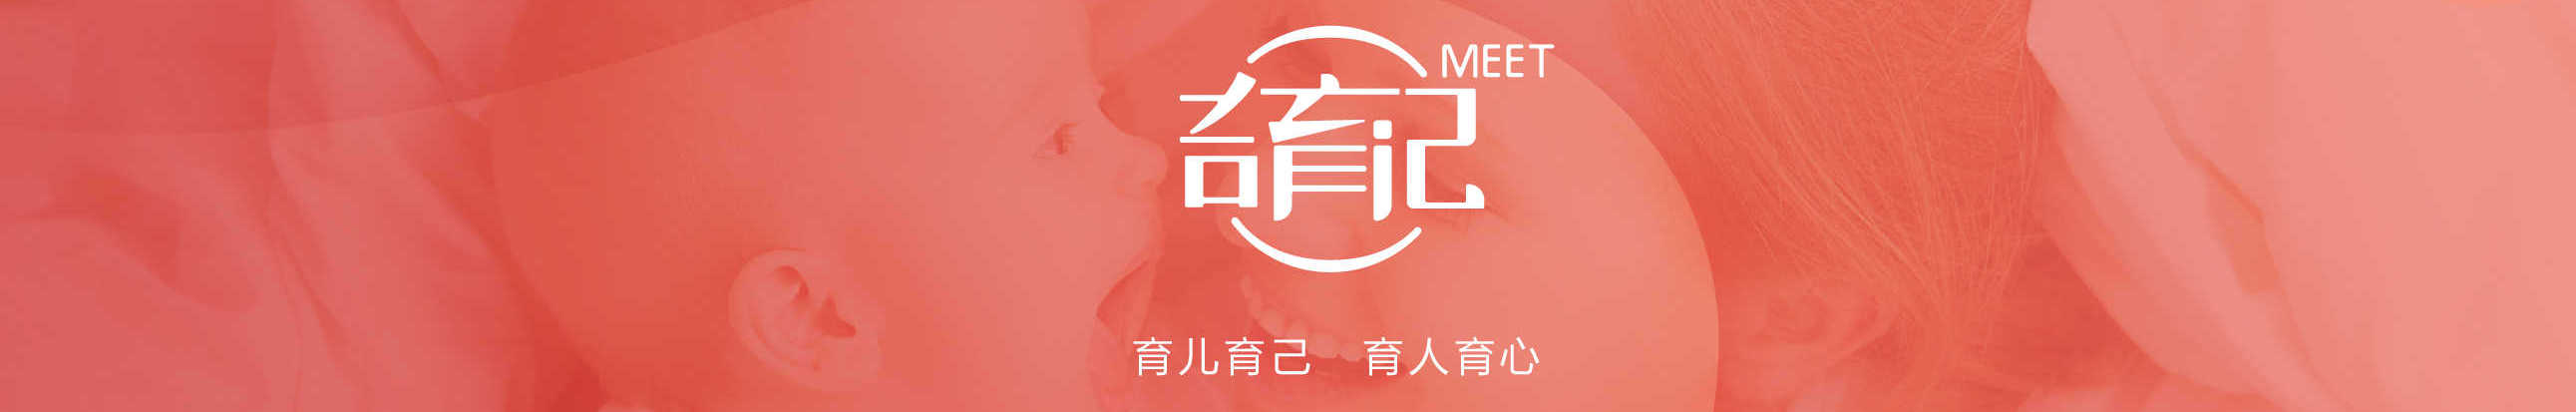 奇育记MEET banner